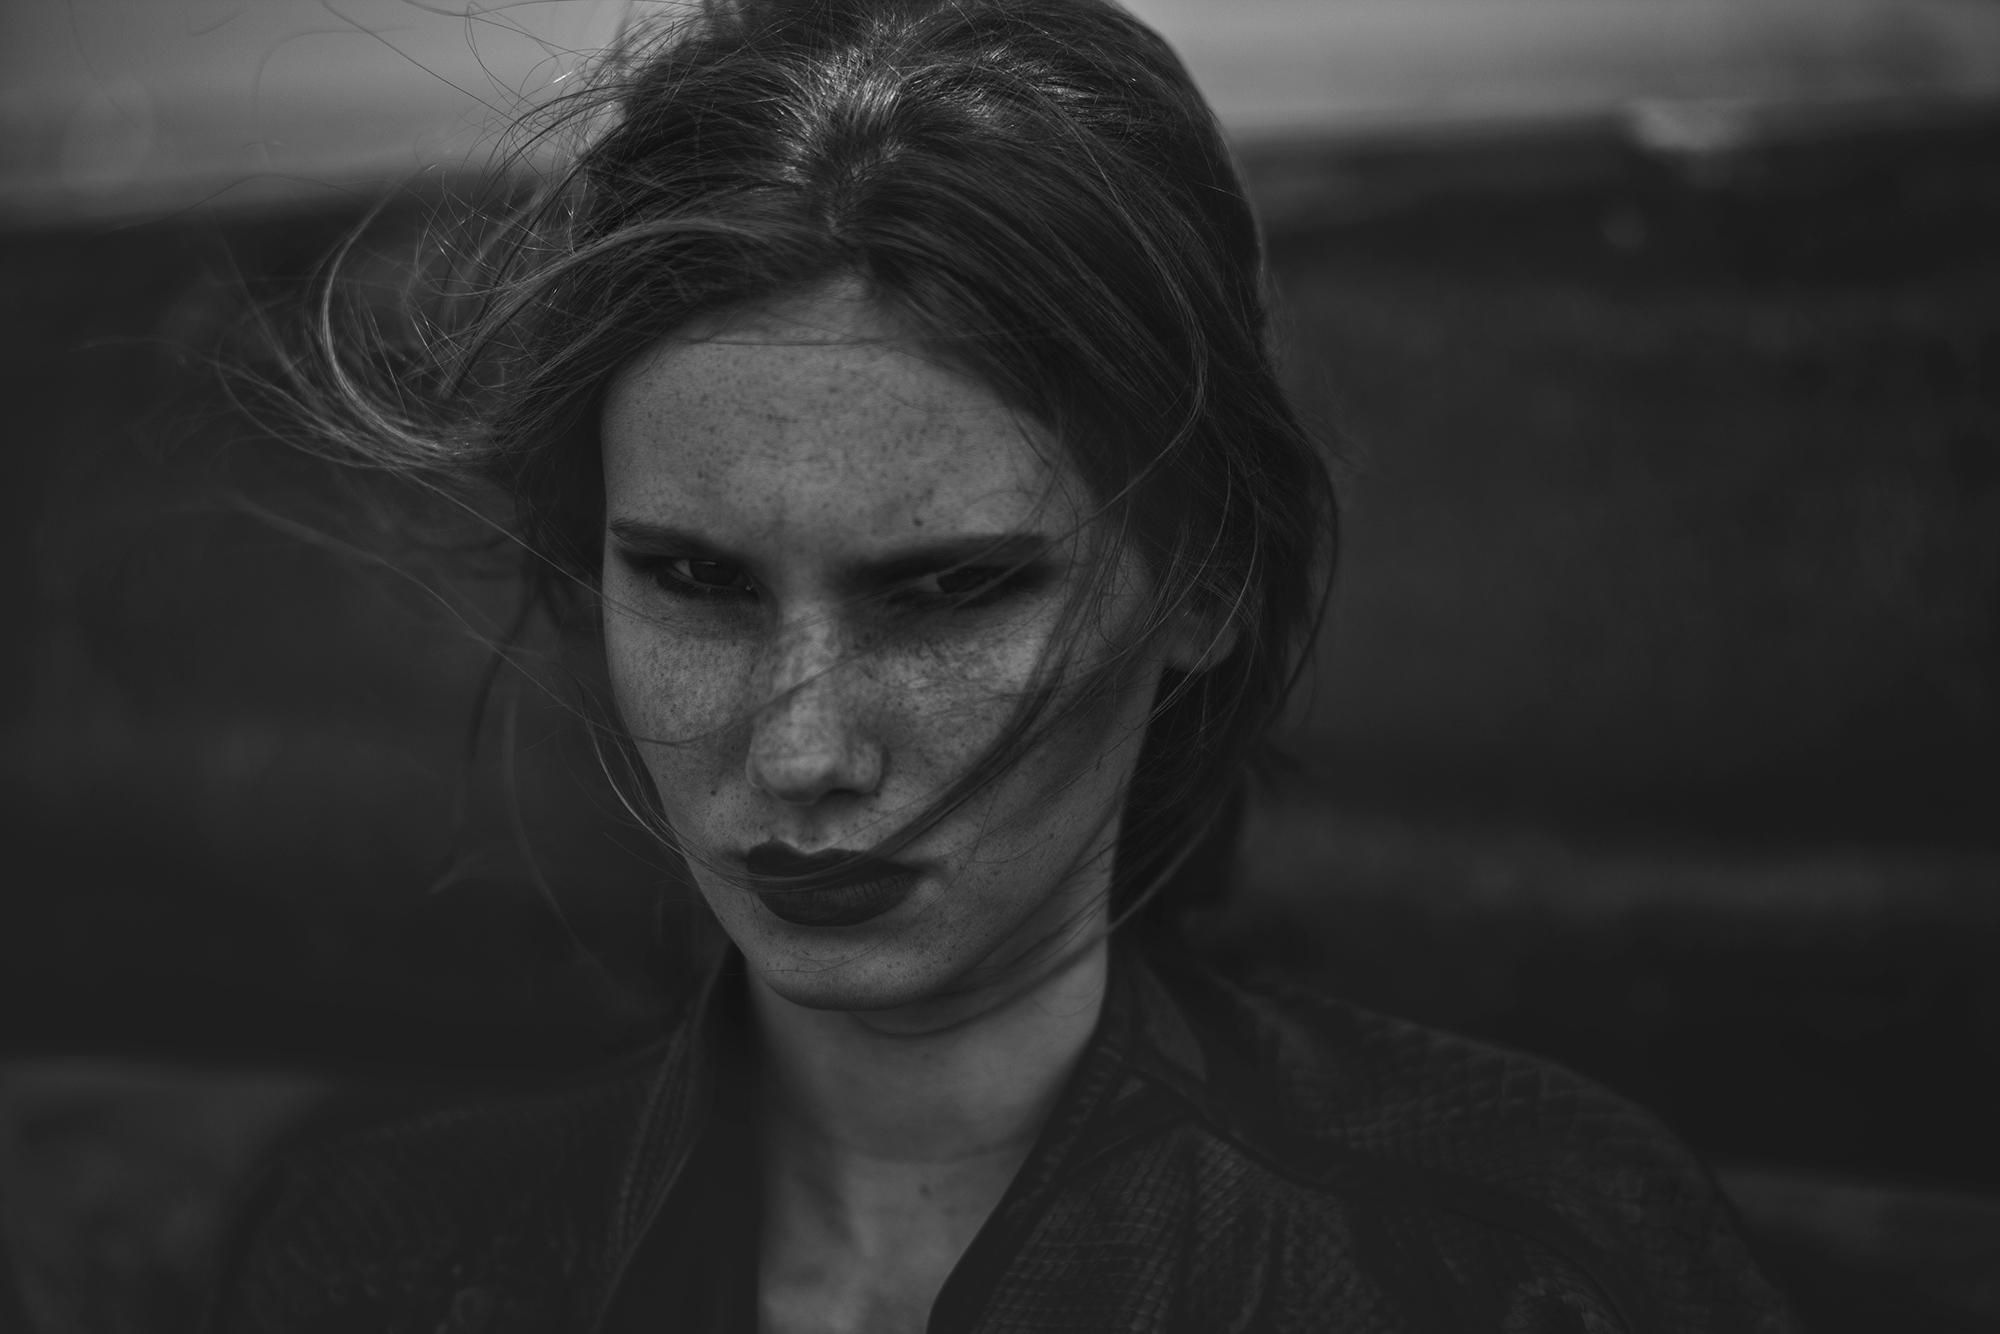 Fantomina Noir - Valerie Suwijn @ Elite Model Management - hair Macik Bednarek MB Hair Stylist - makeup Sara Conesa (MakeUp101BySara) - stylist Lffashionstylingcom